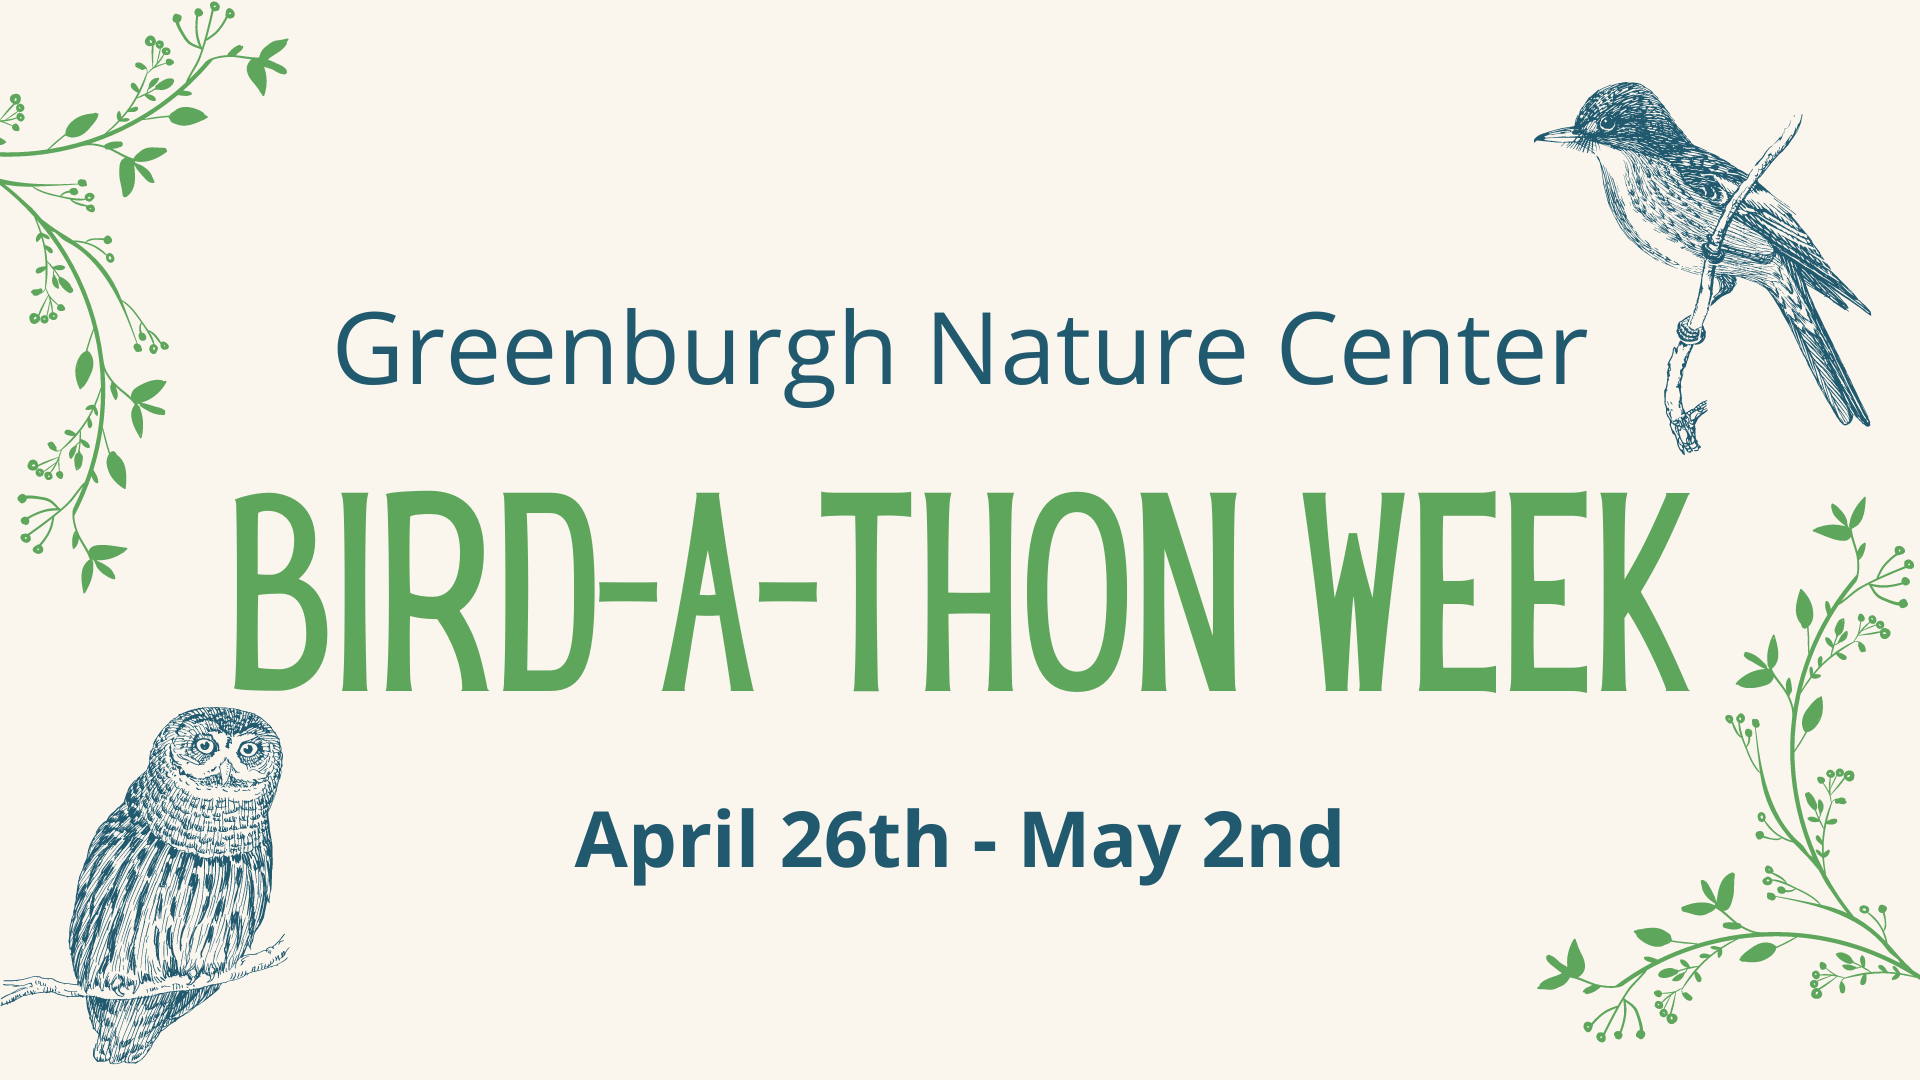 Bird-a-thon at Greenburgh Nature Center